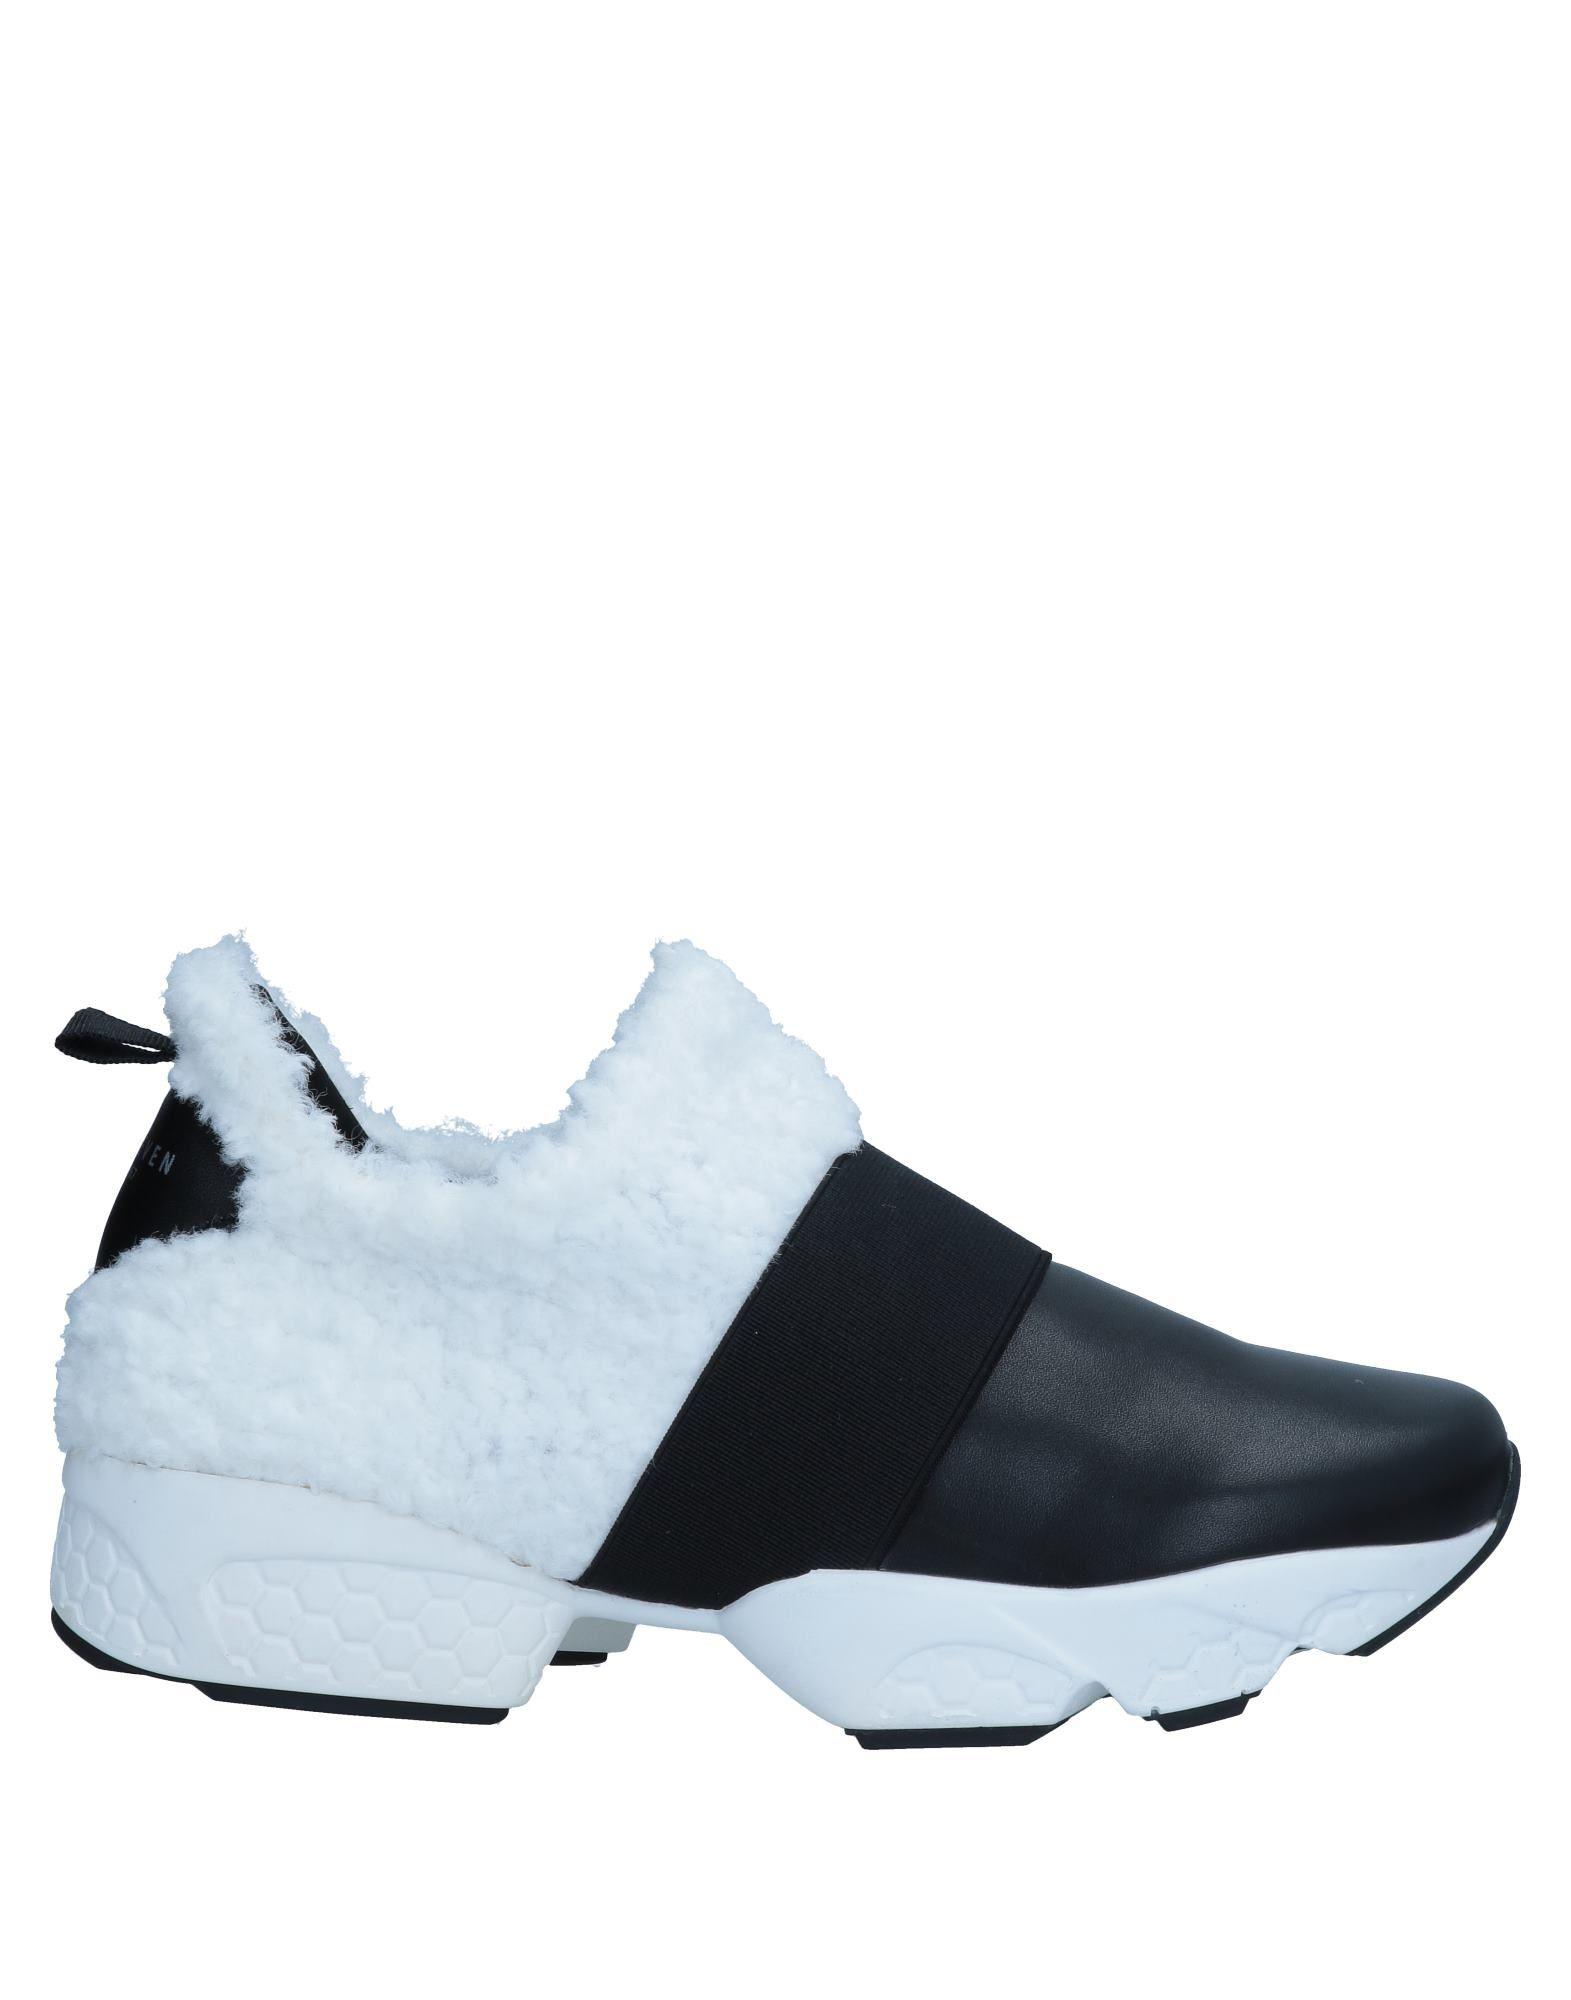 67 on Sixtyseven Sneakers - Women 67 Sixtyseven Sneakers online on 67  Australia - 11543646JB 255e65